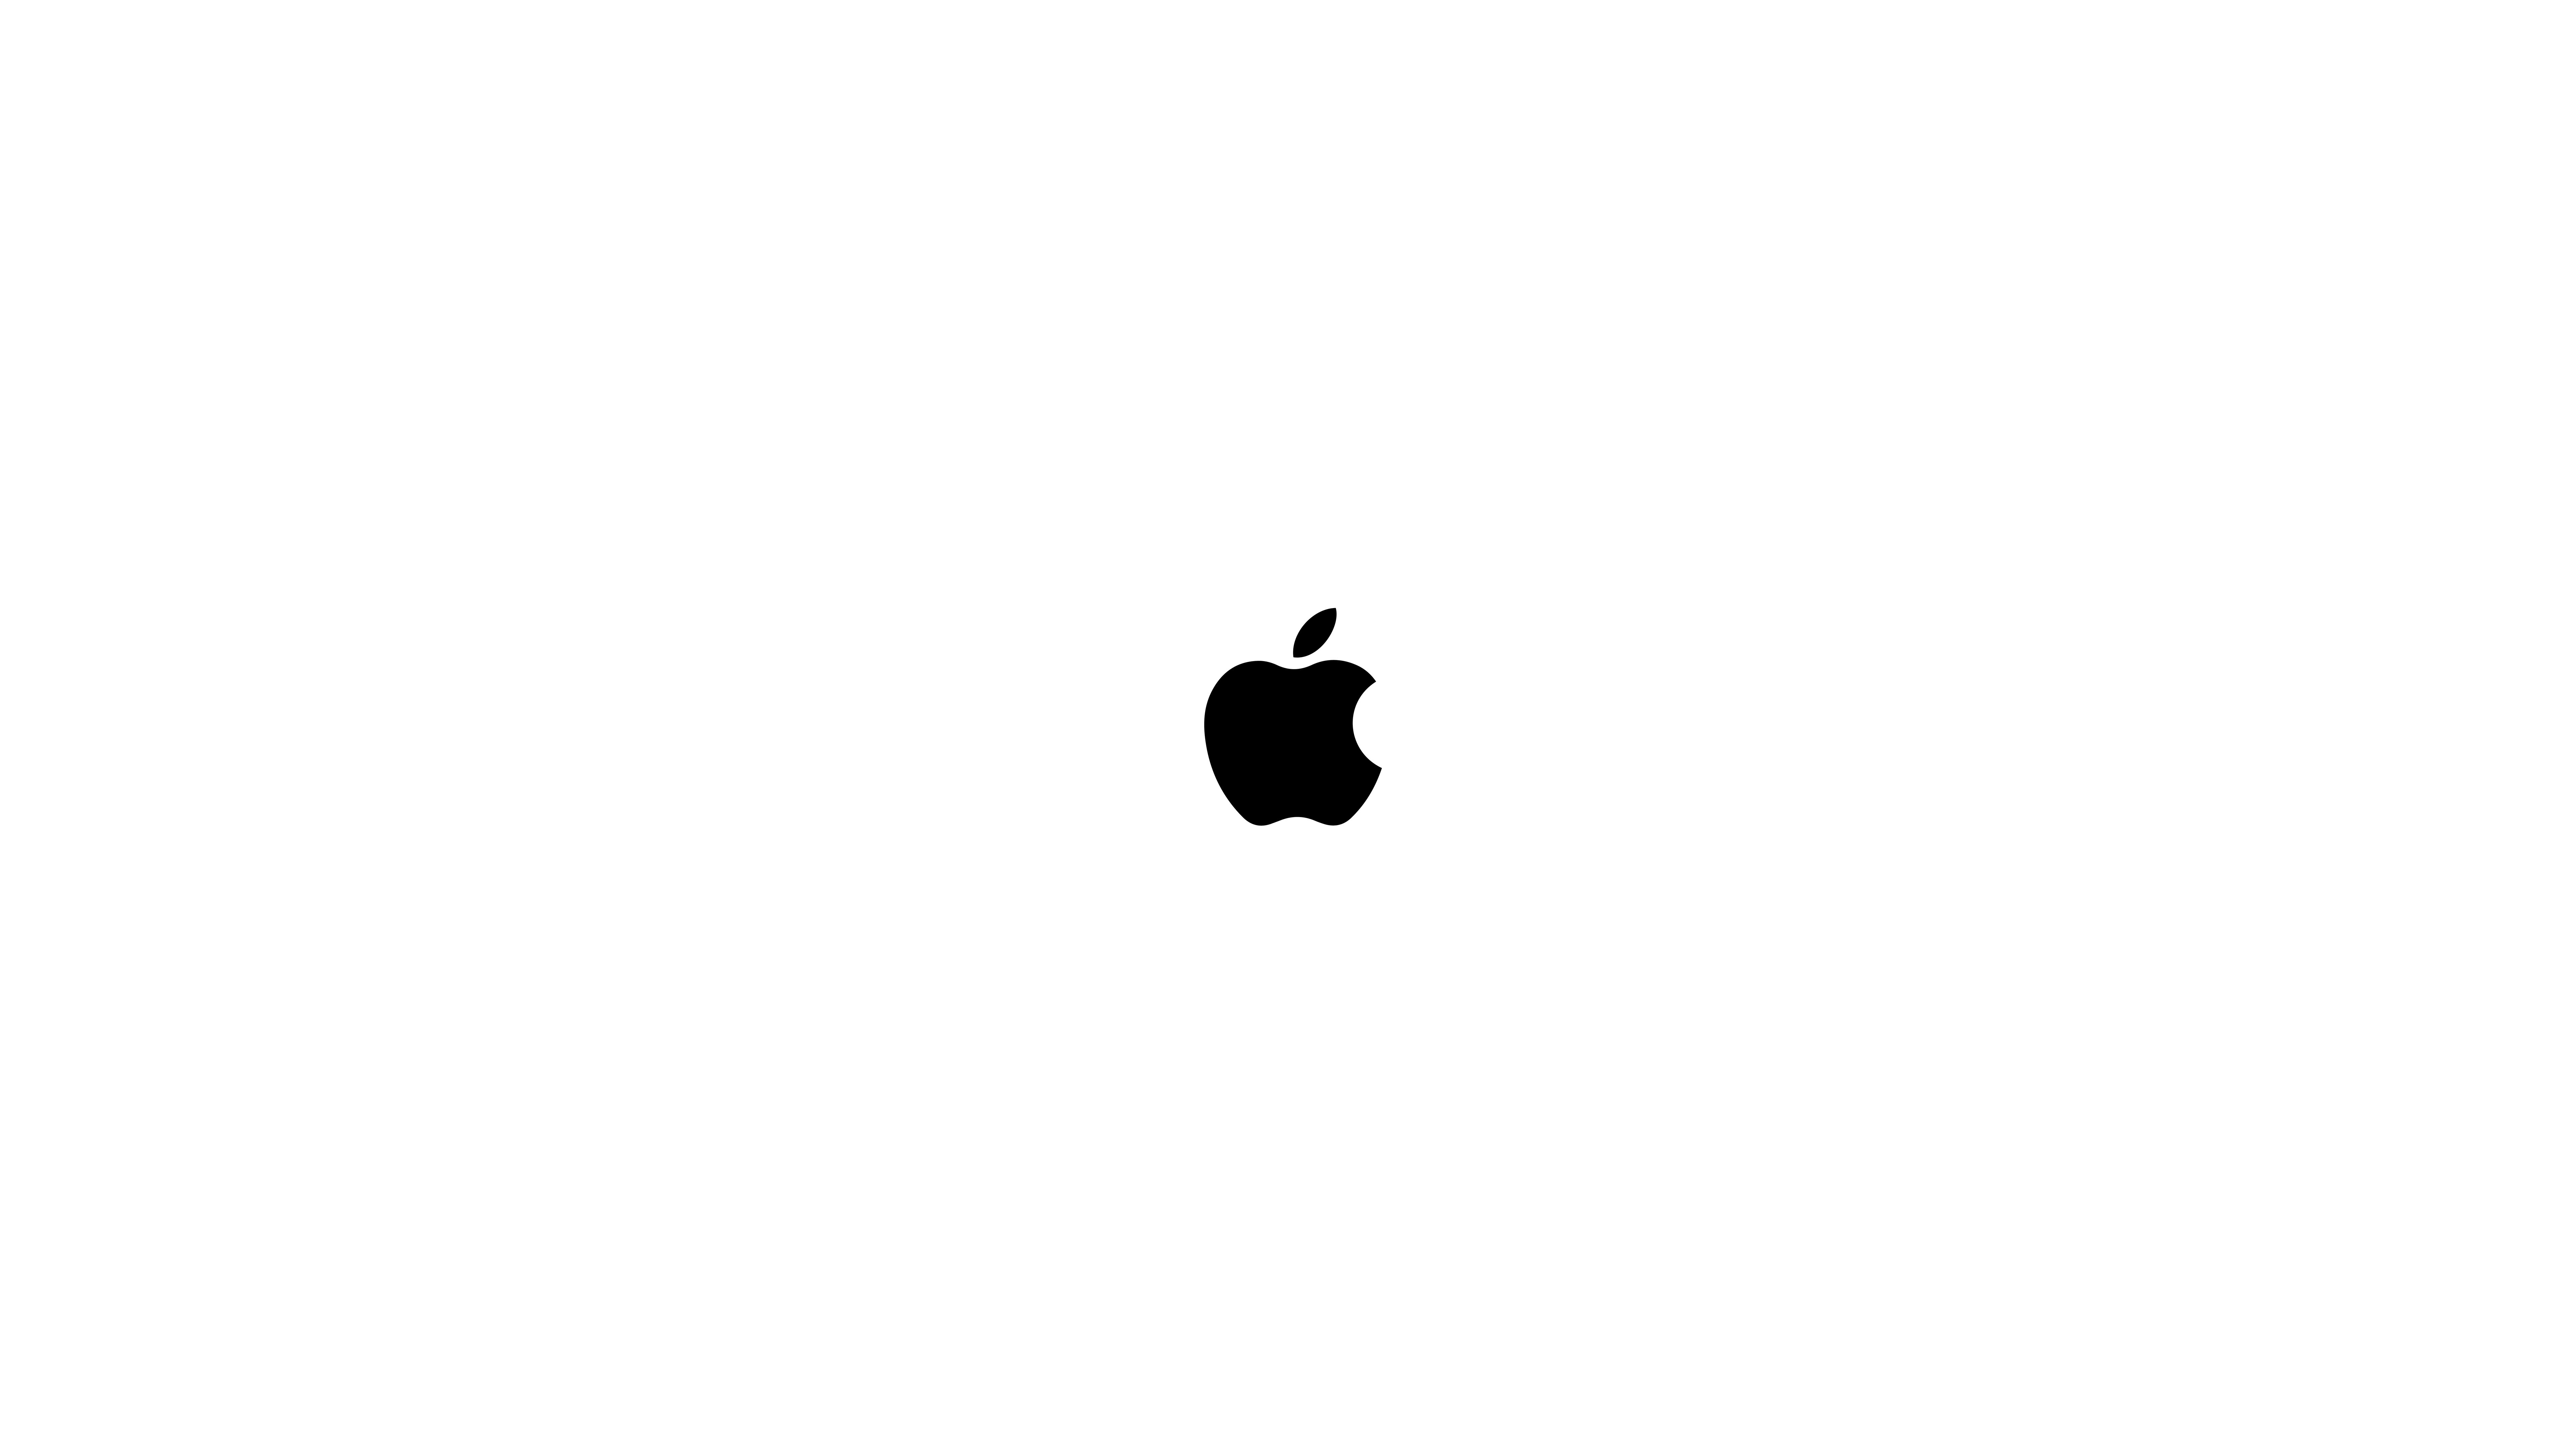 Black Apple Logo UHD 8K Wallpaper  Pixelz